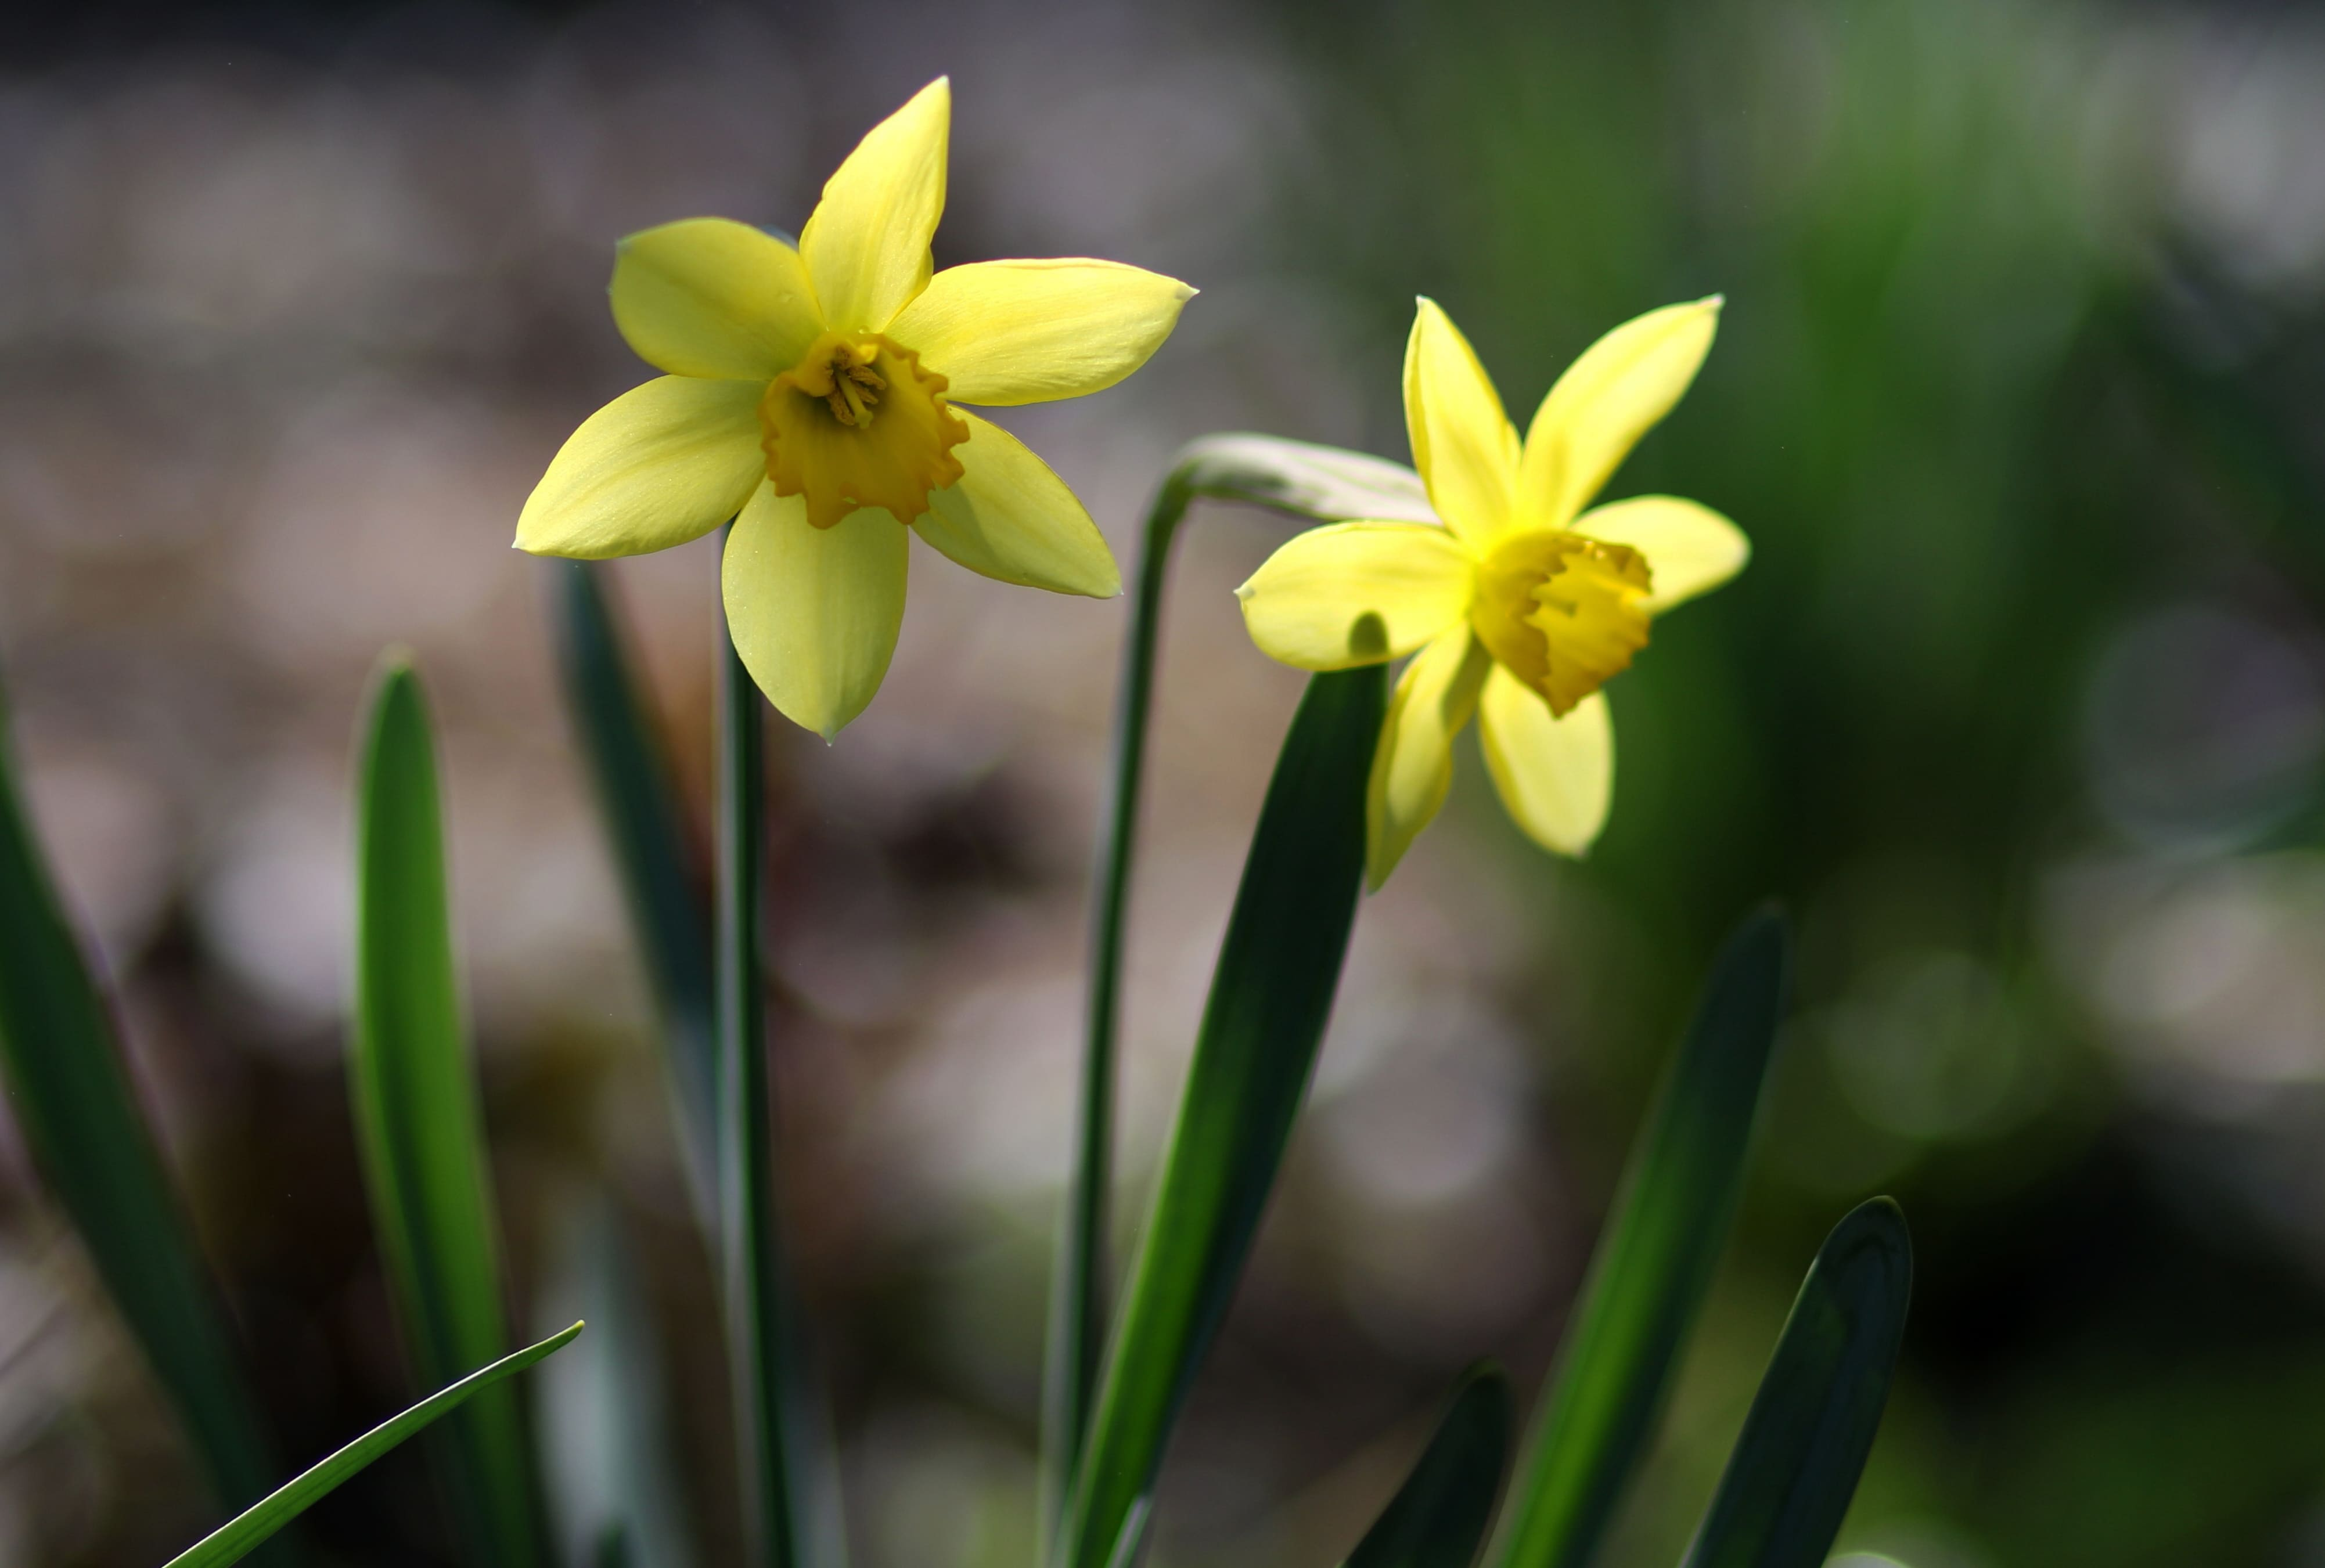 daffodils-photo-70